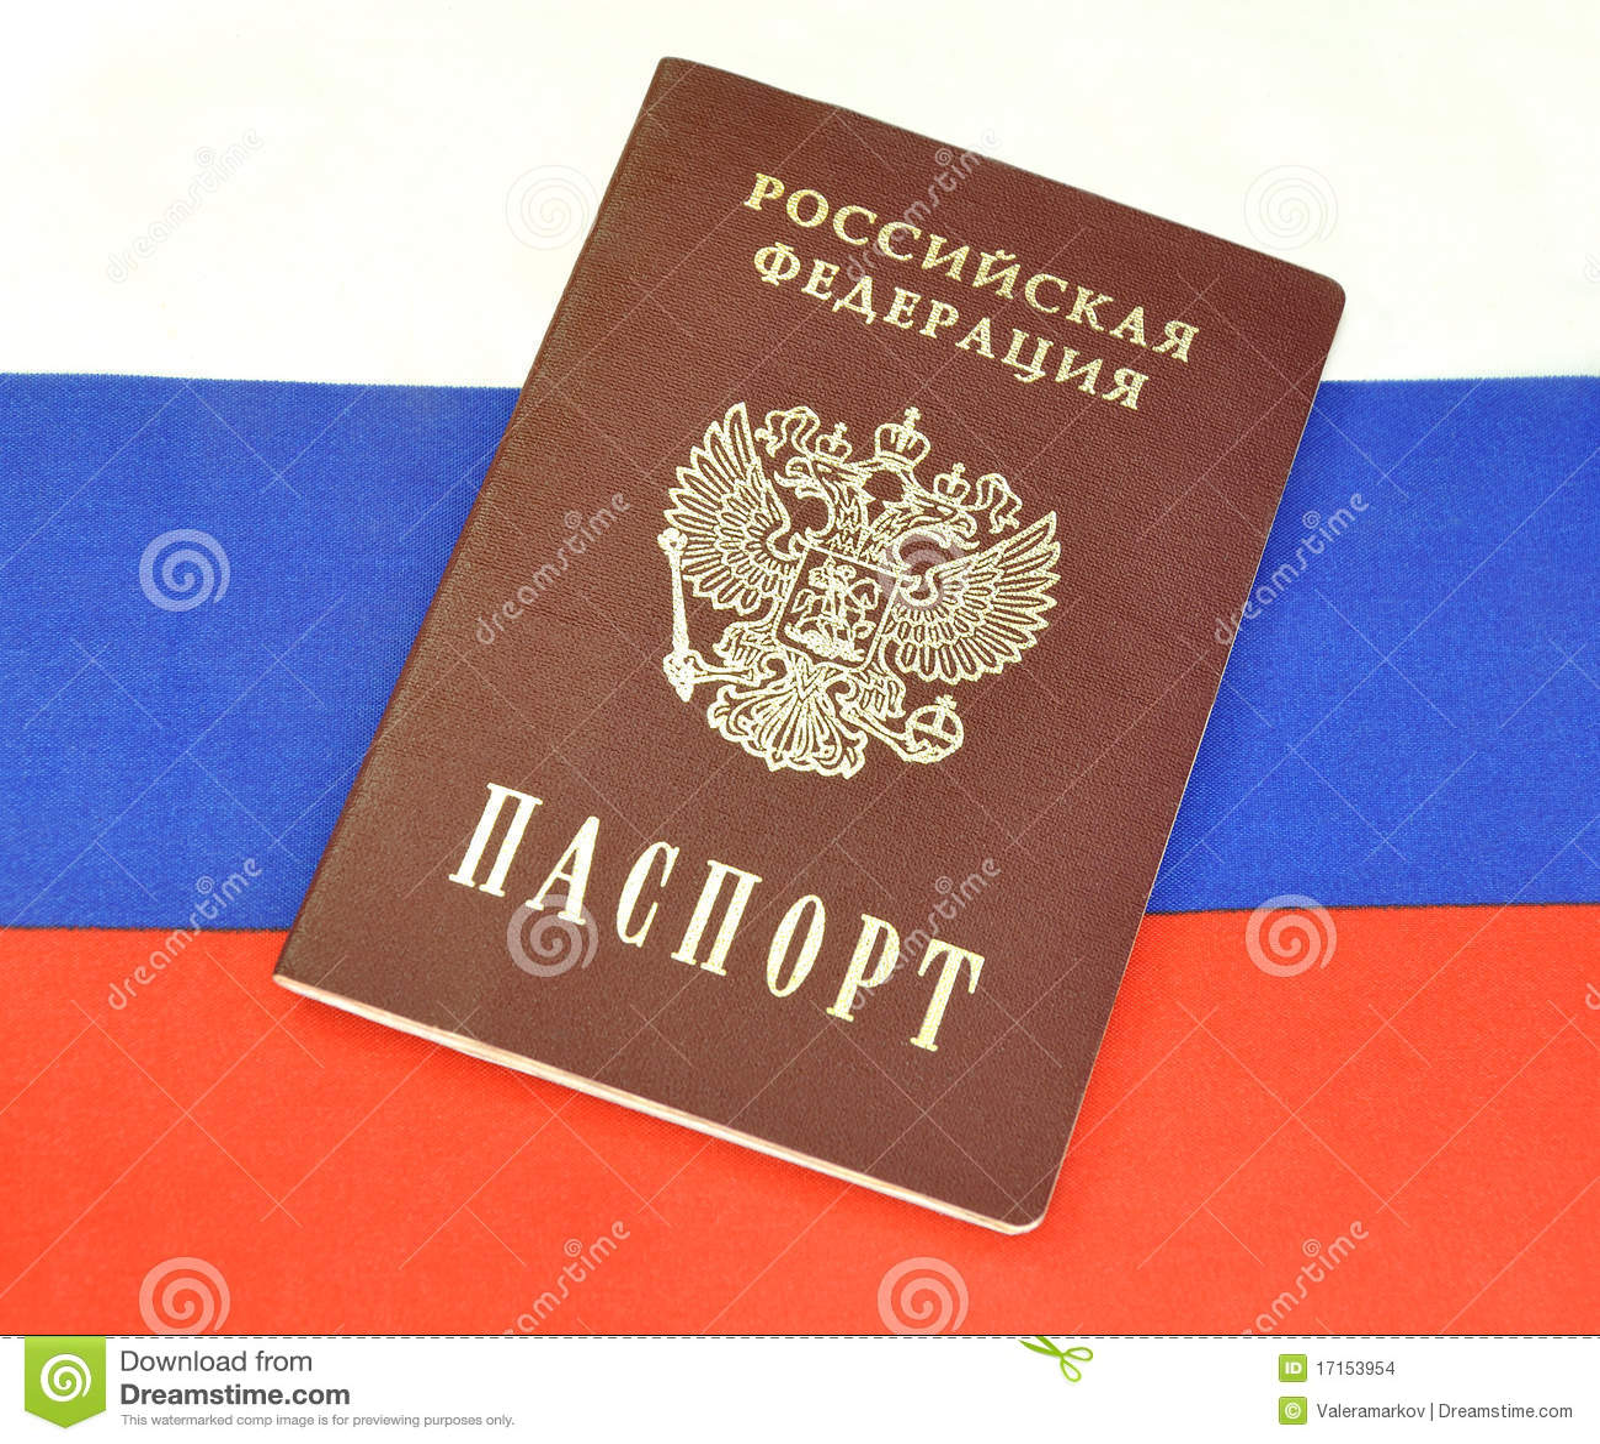 Las mujeres rusas dating - sitio ruso novias